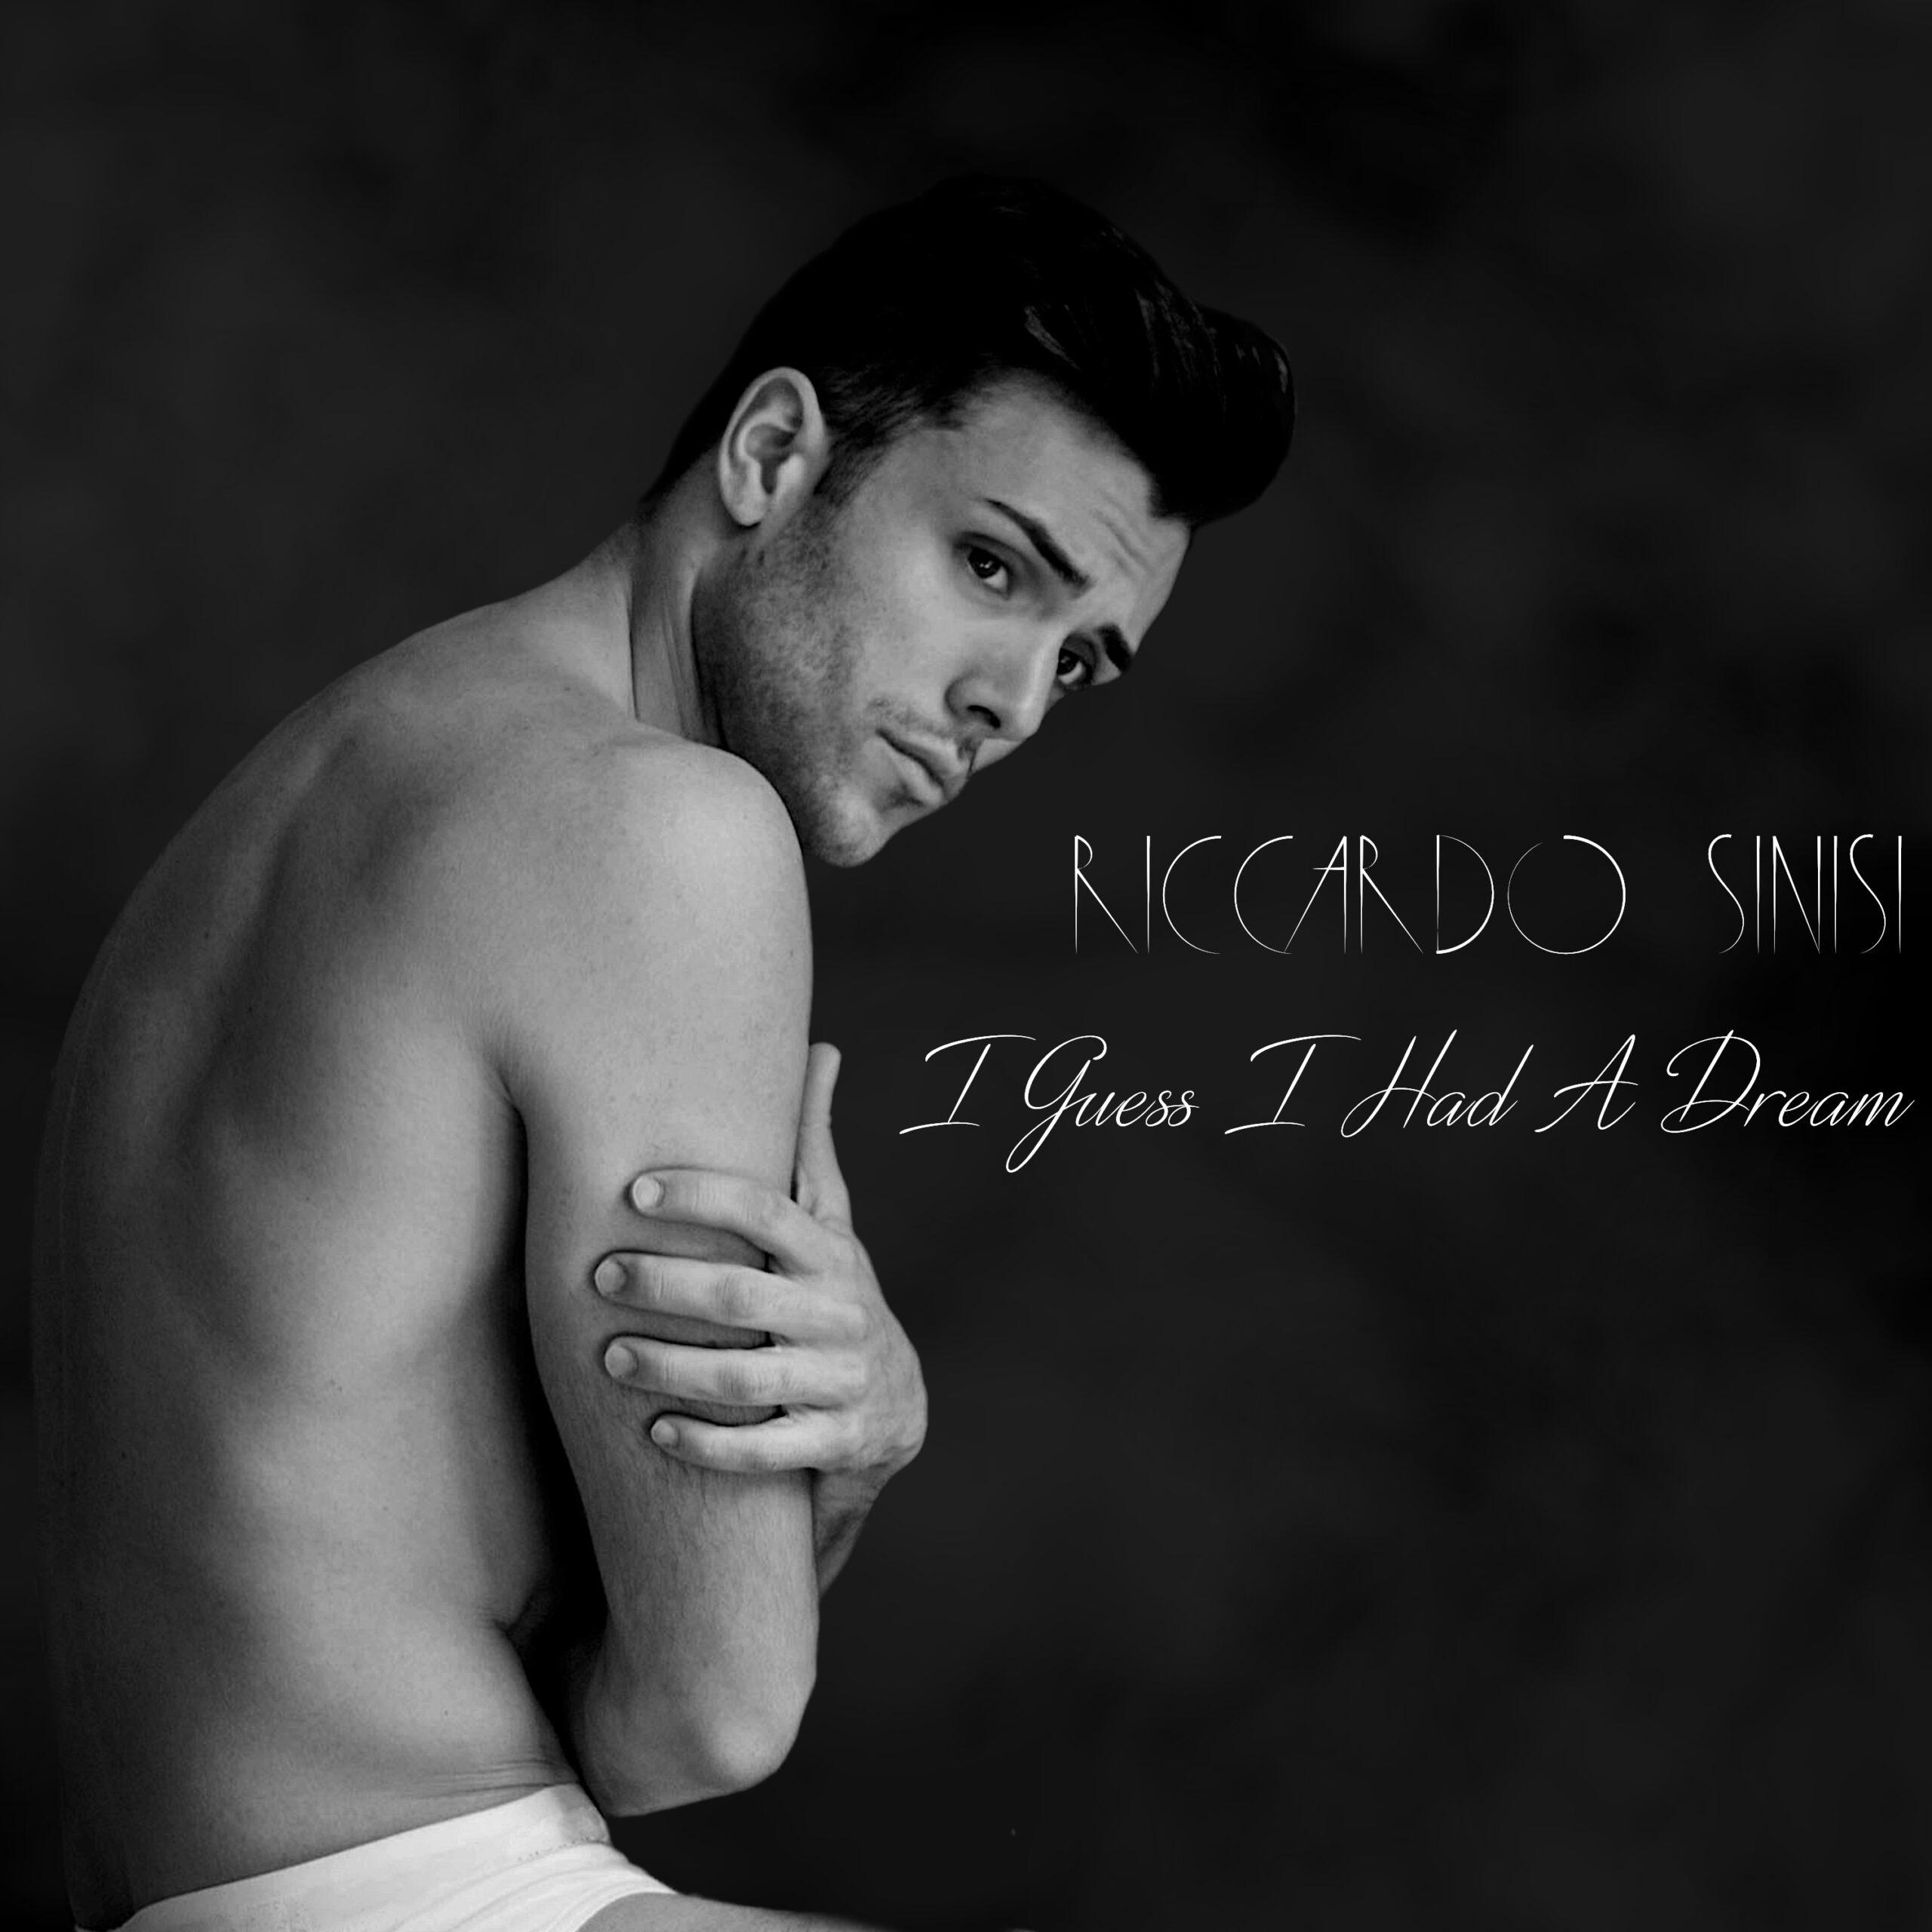 """I guess I Had a Dream"": singolo inedito per Riccardo Sinisi"